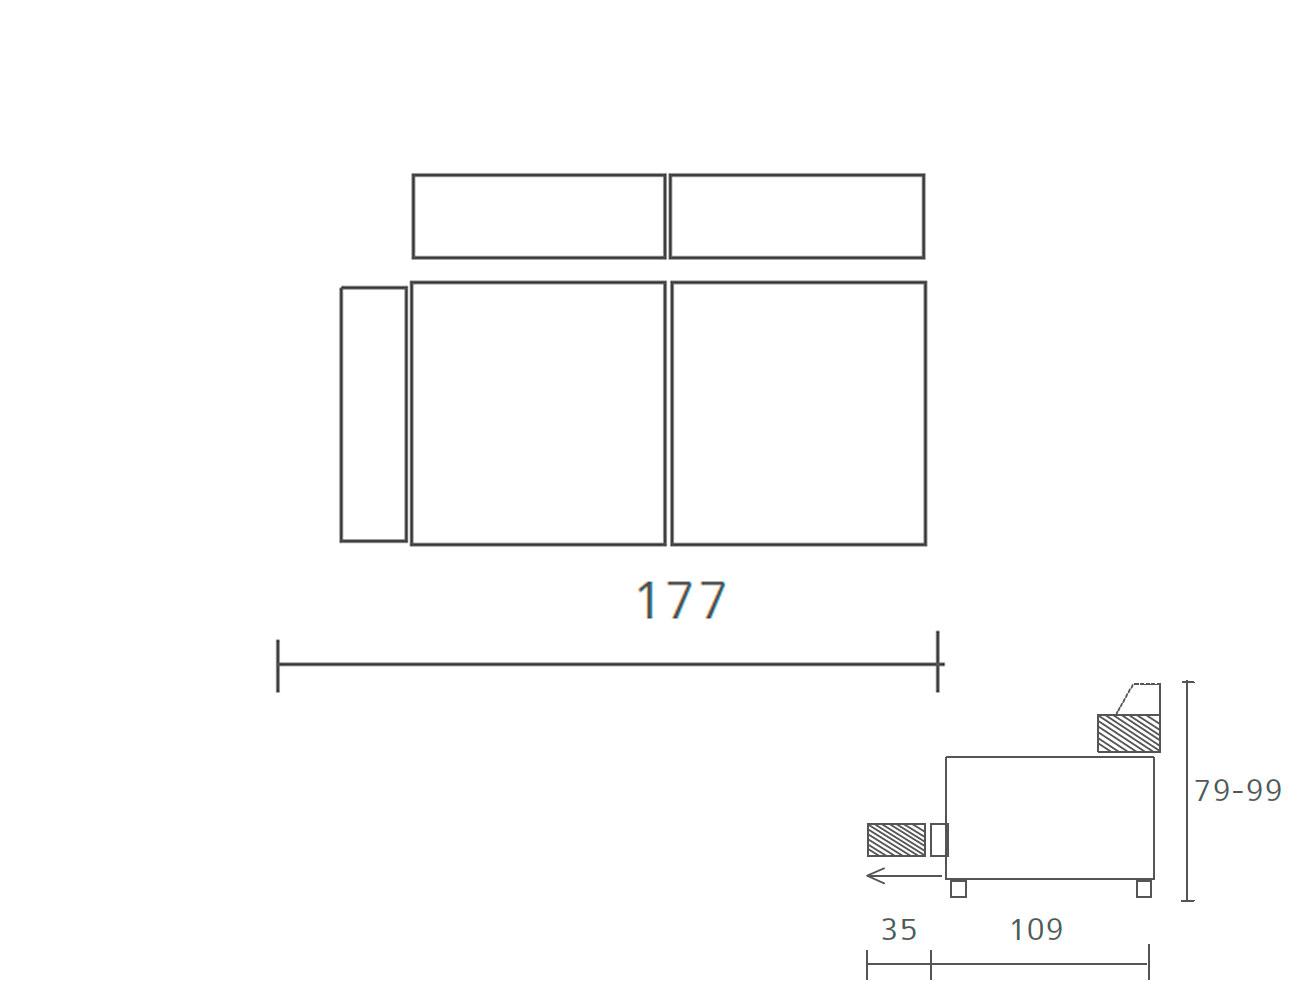 Sofa piel 2 plazas 1772